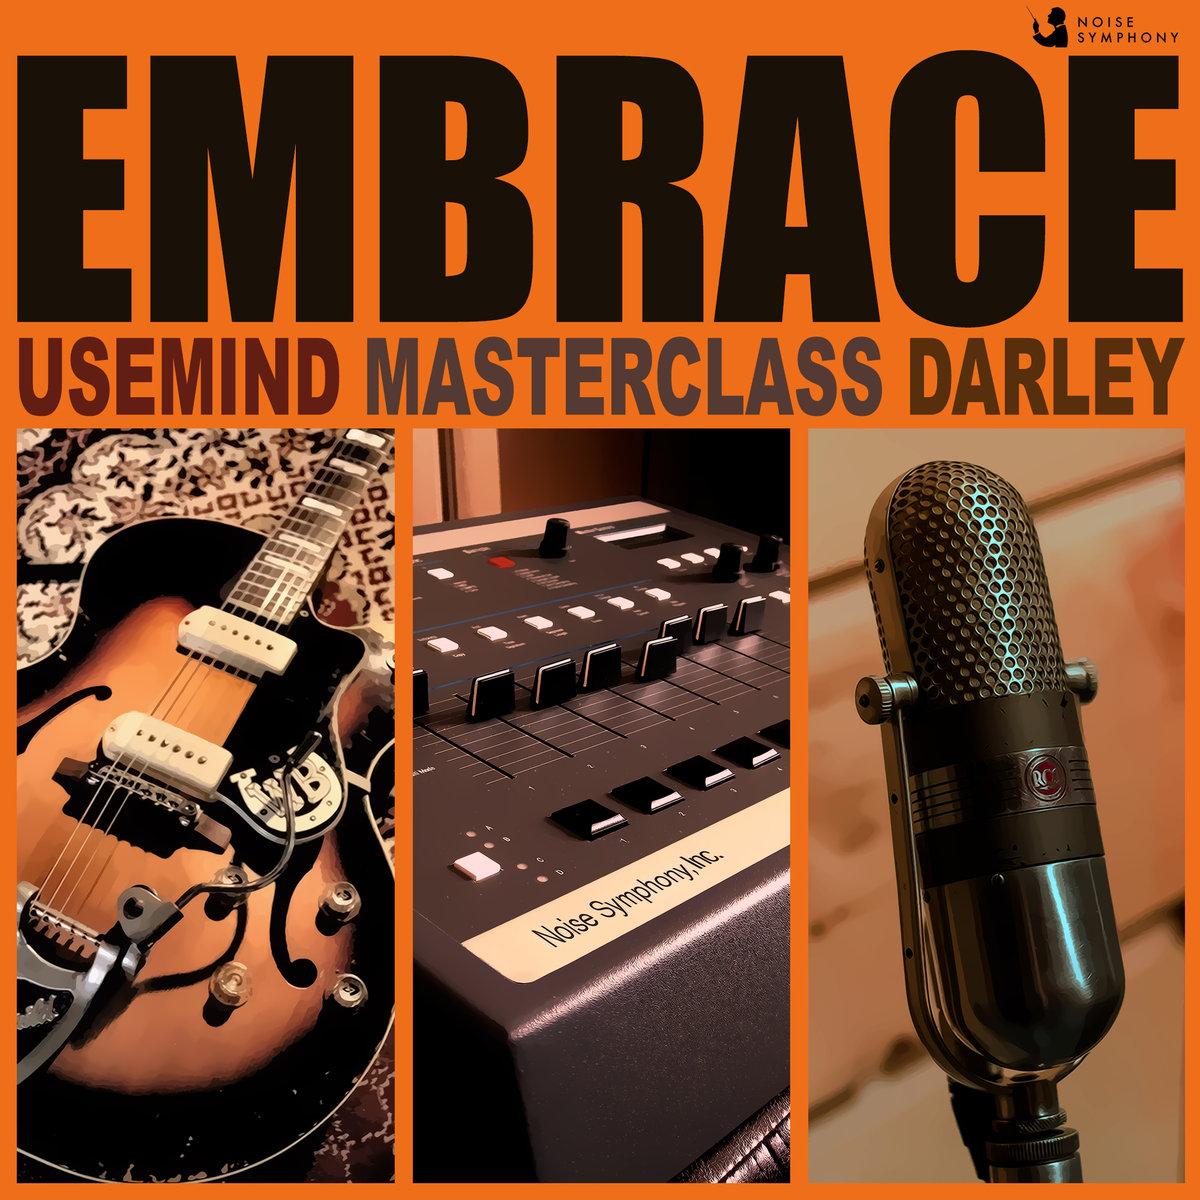 Usemind, Masterclass, Darley - Embrace